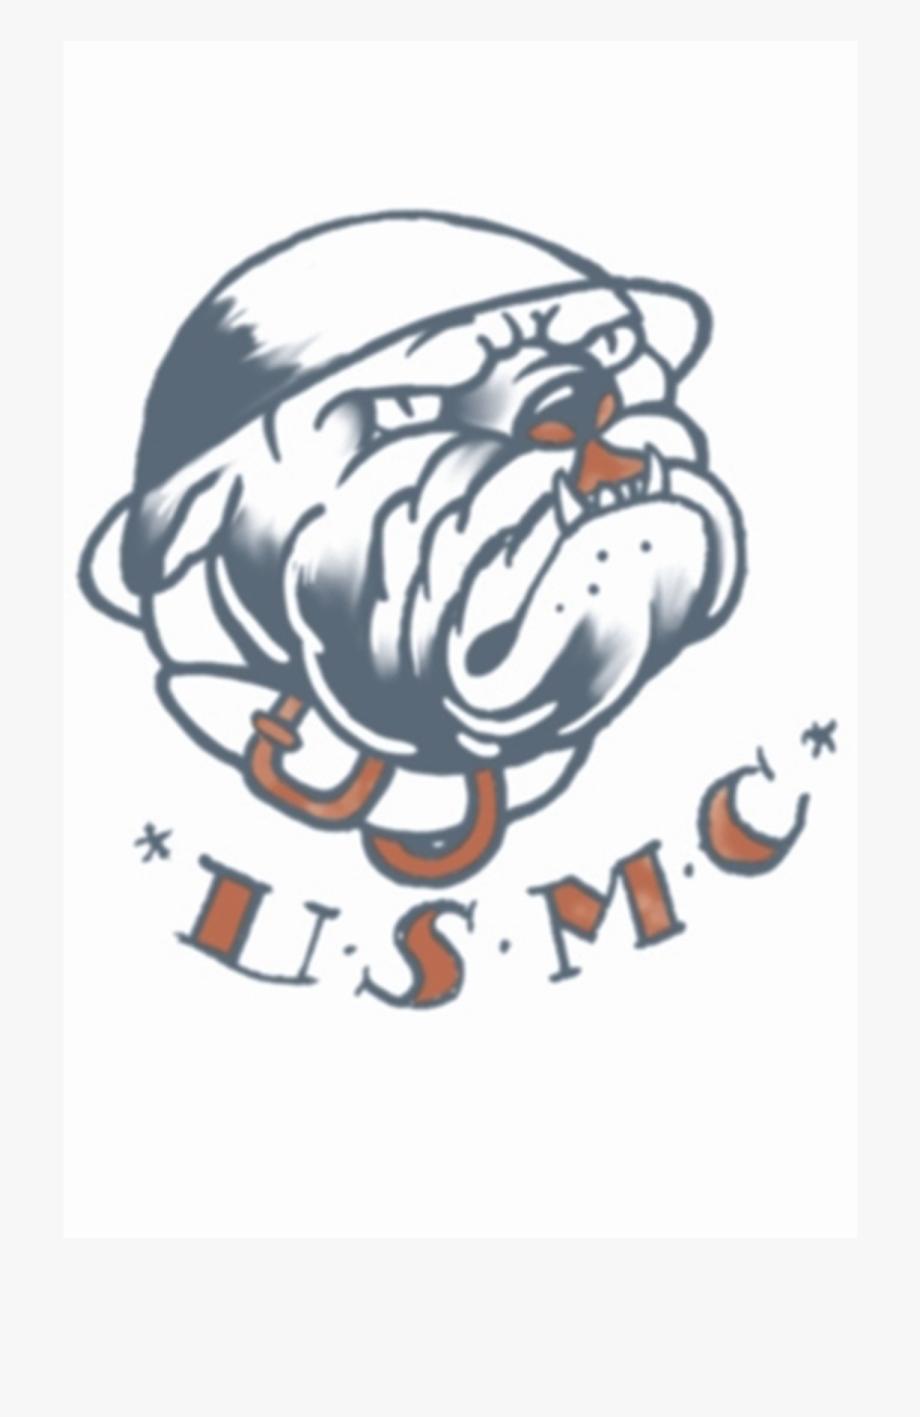 Usmc mom clipart jpg freeuse download Tinsley Transfers Temporary Military Tattoos, Usmc - Usmc ... jpg freeuse download